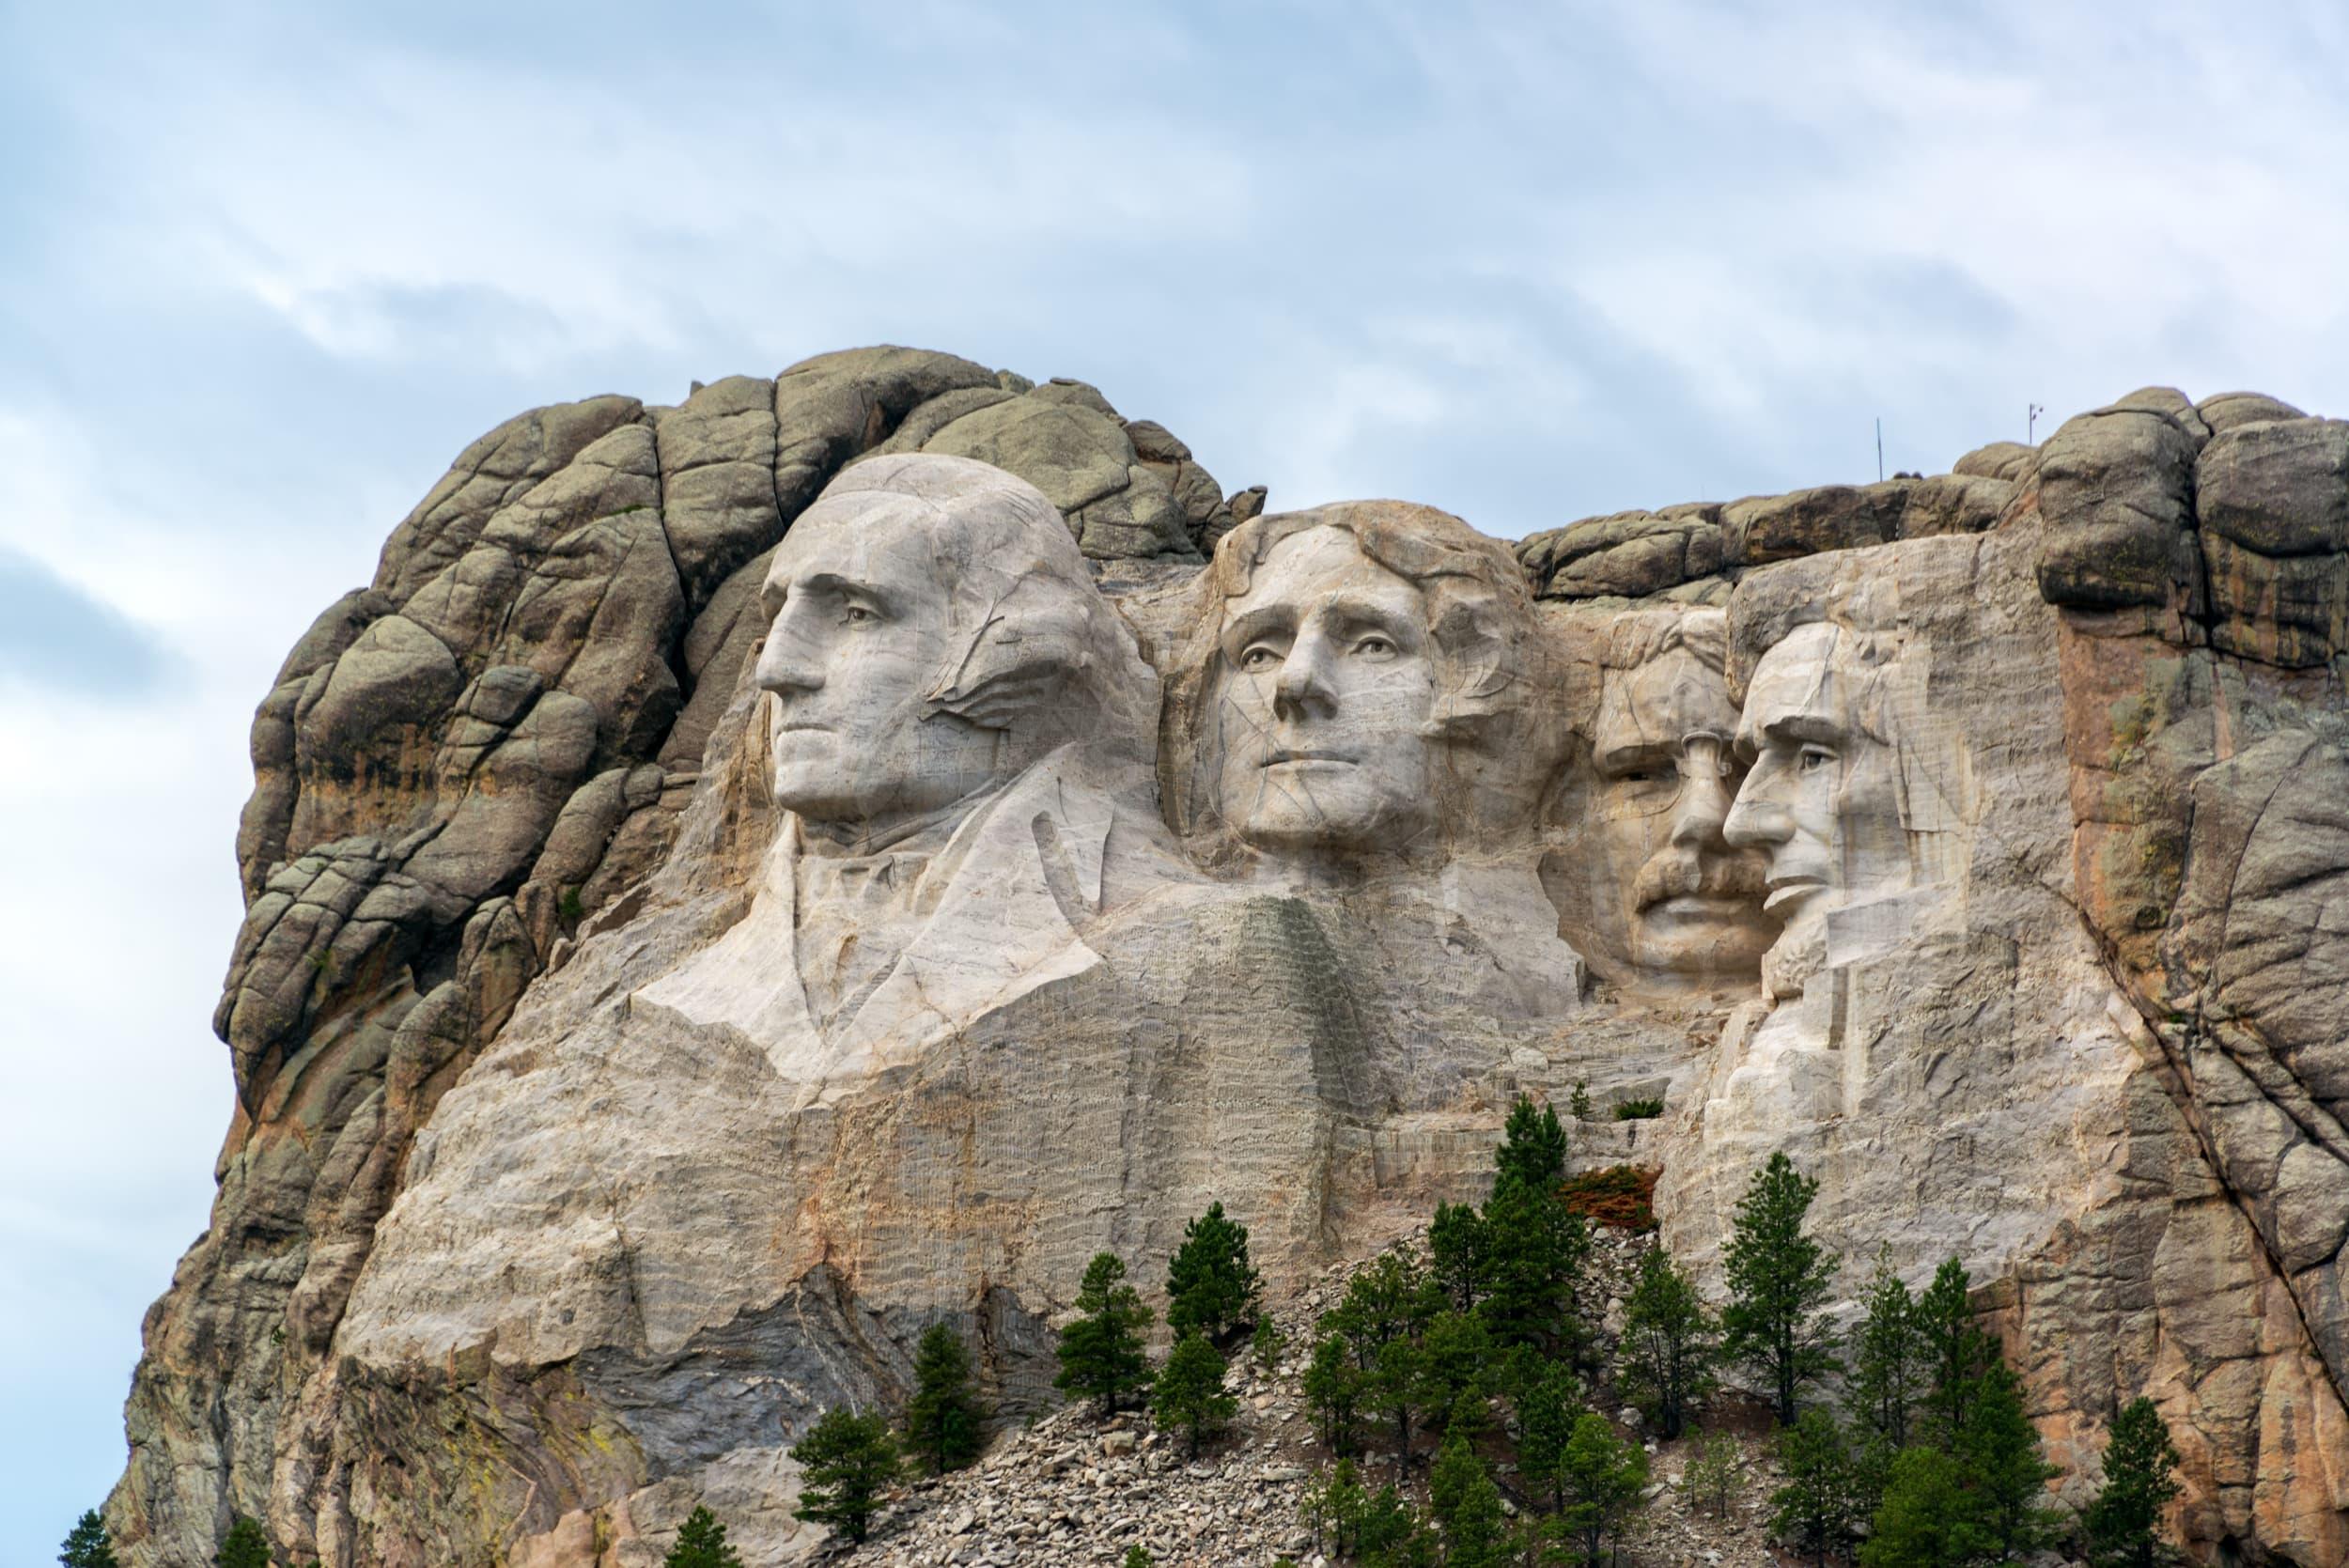 View of Mount Rushmore National Monument near Keystone, South Dakota